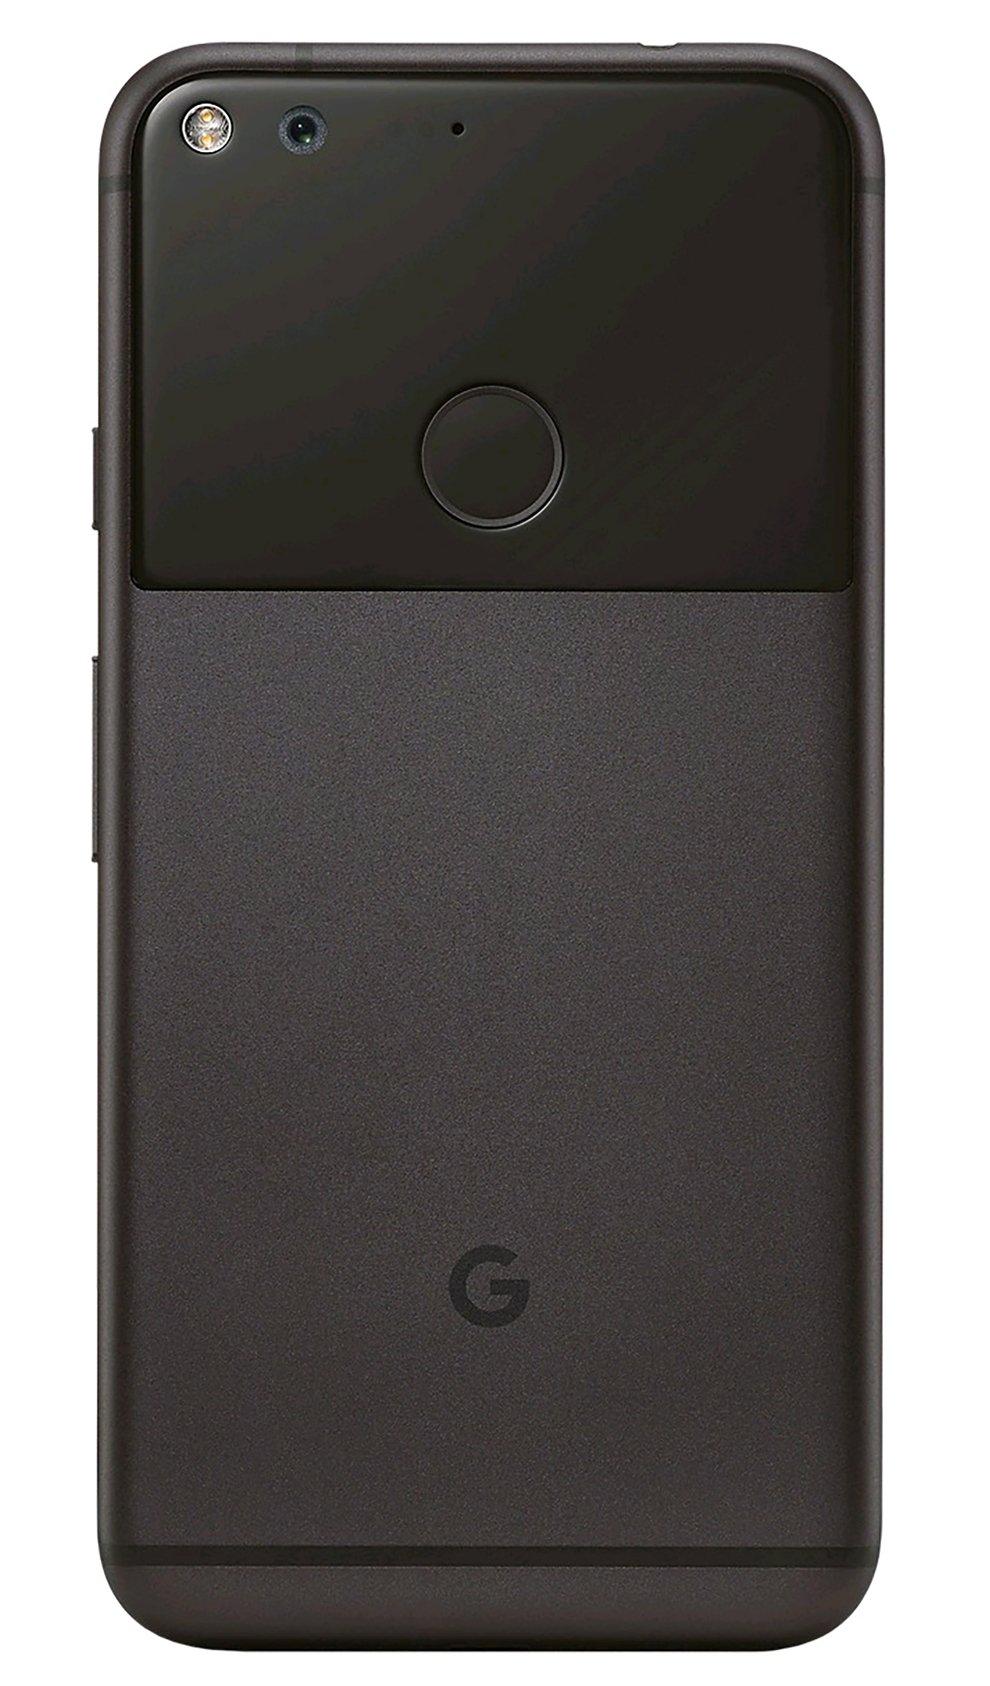 Google Pixel XL 128GB Unlocked GSM Phone w/ 12.3MP Camera – Quite Black